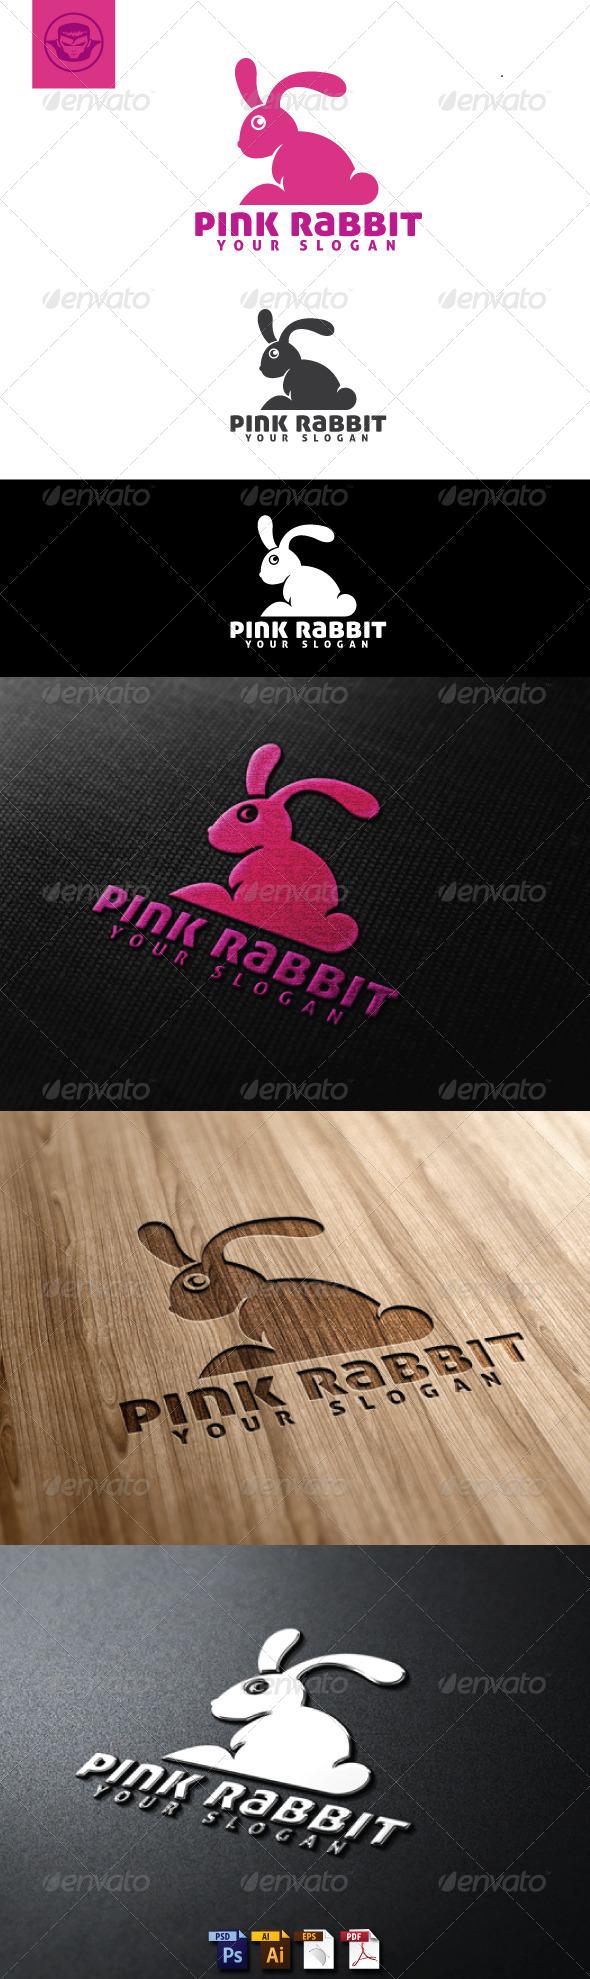 Pink Rabbit Logo Template - Animals Logo Templates